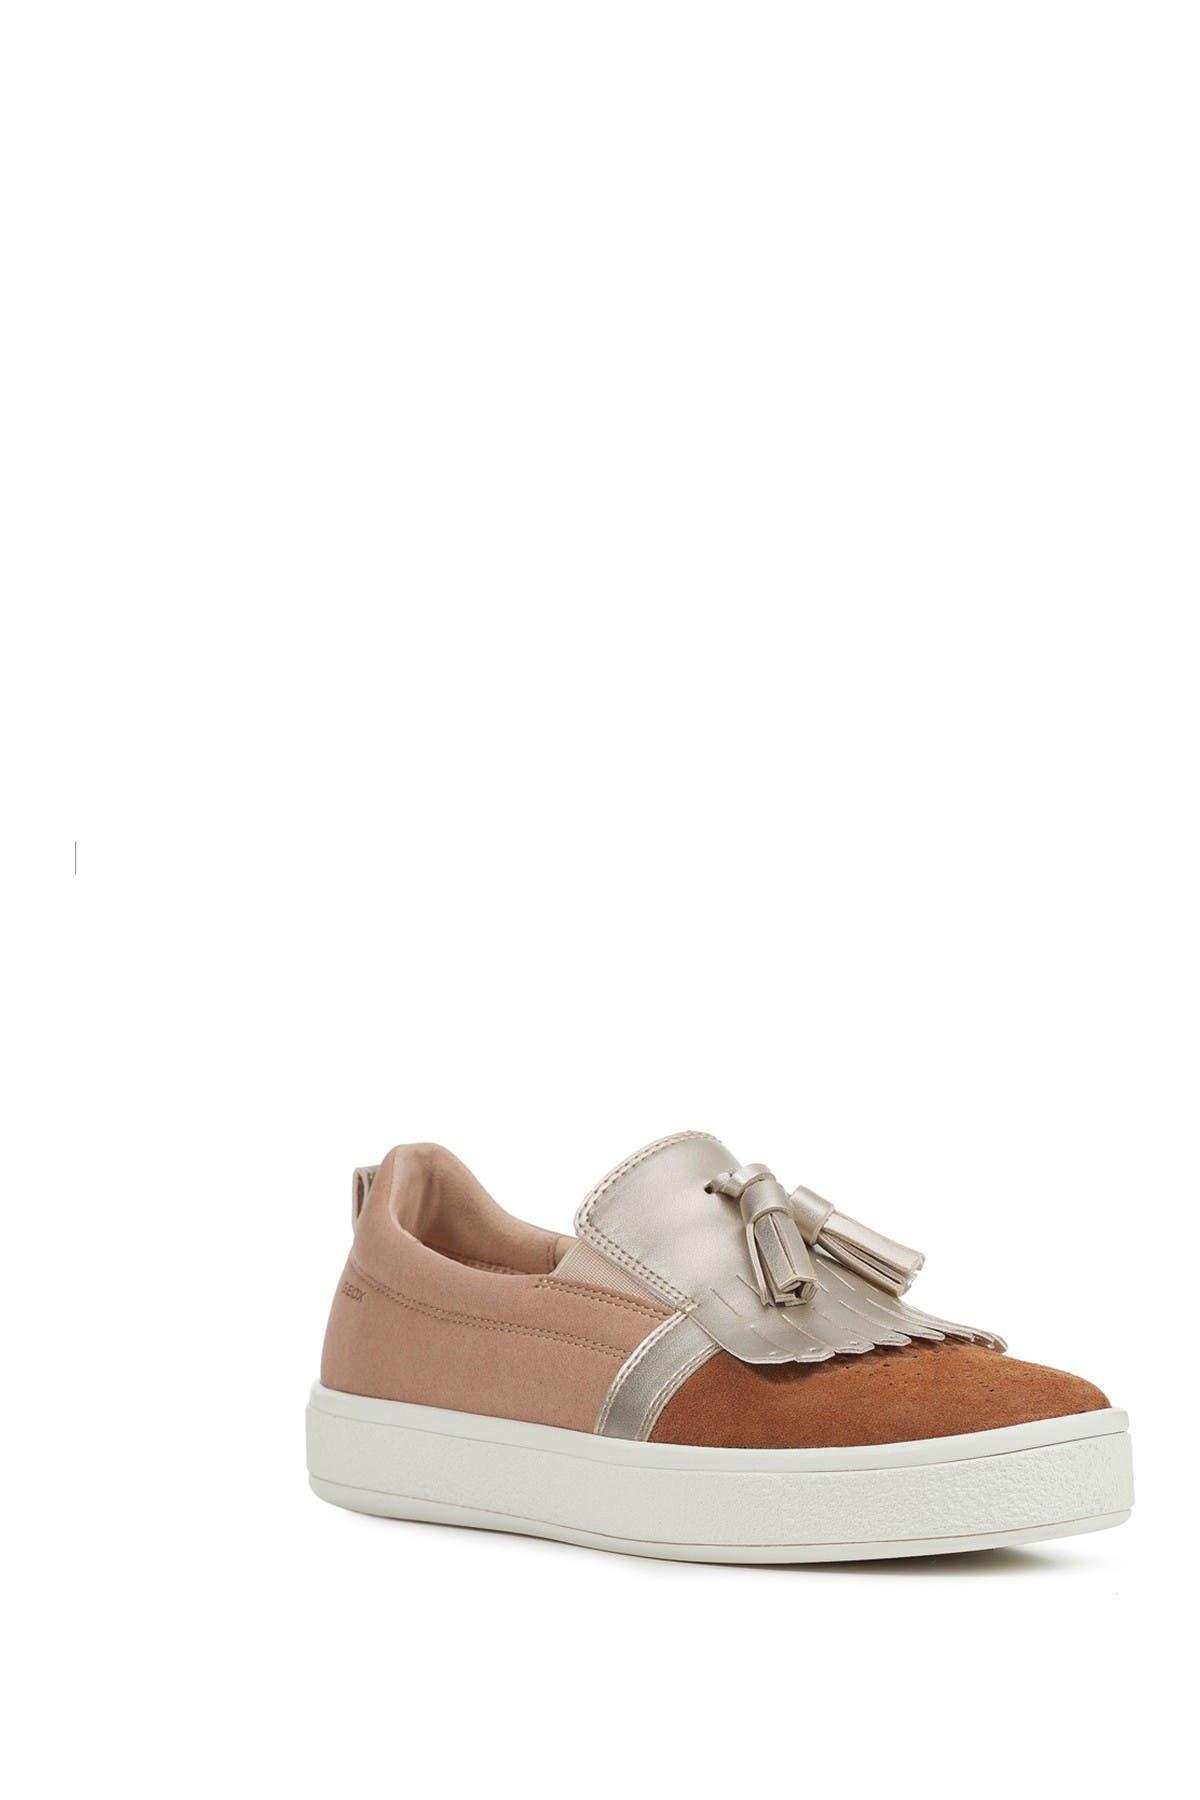 Image of GEOX Lee Kiltie Slip-On Sneaker